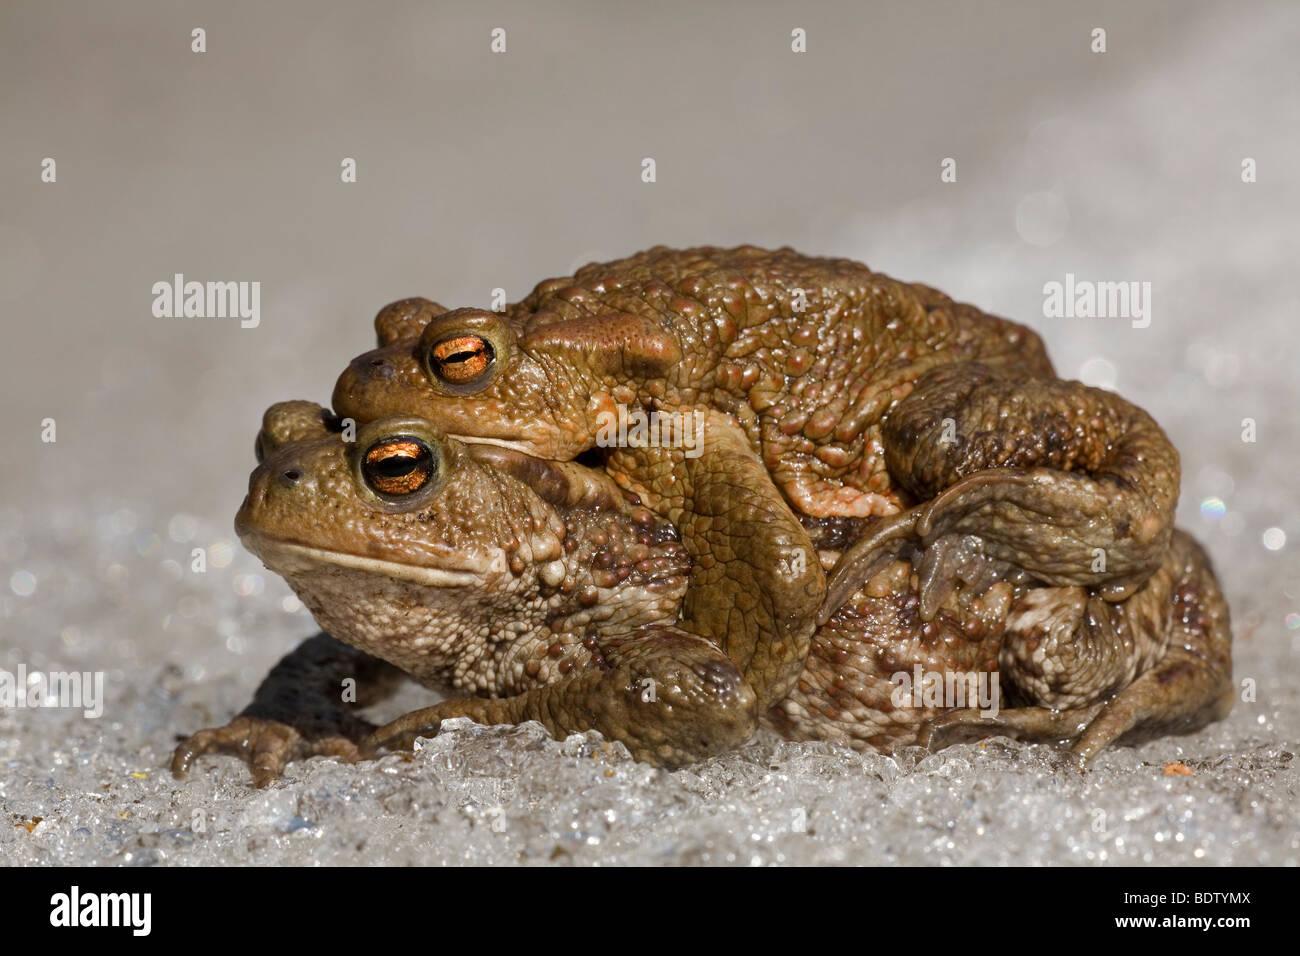 Erdkroete - (Erdkroetenpaar), Common Toad - male & female (Bufo bufo) Stock Photo